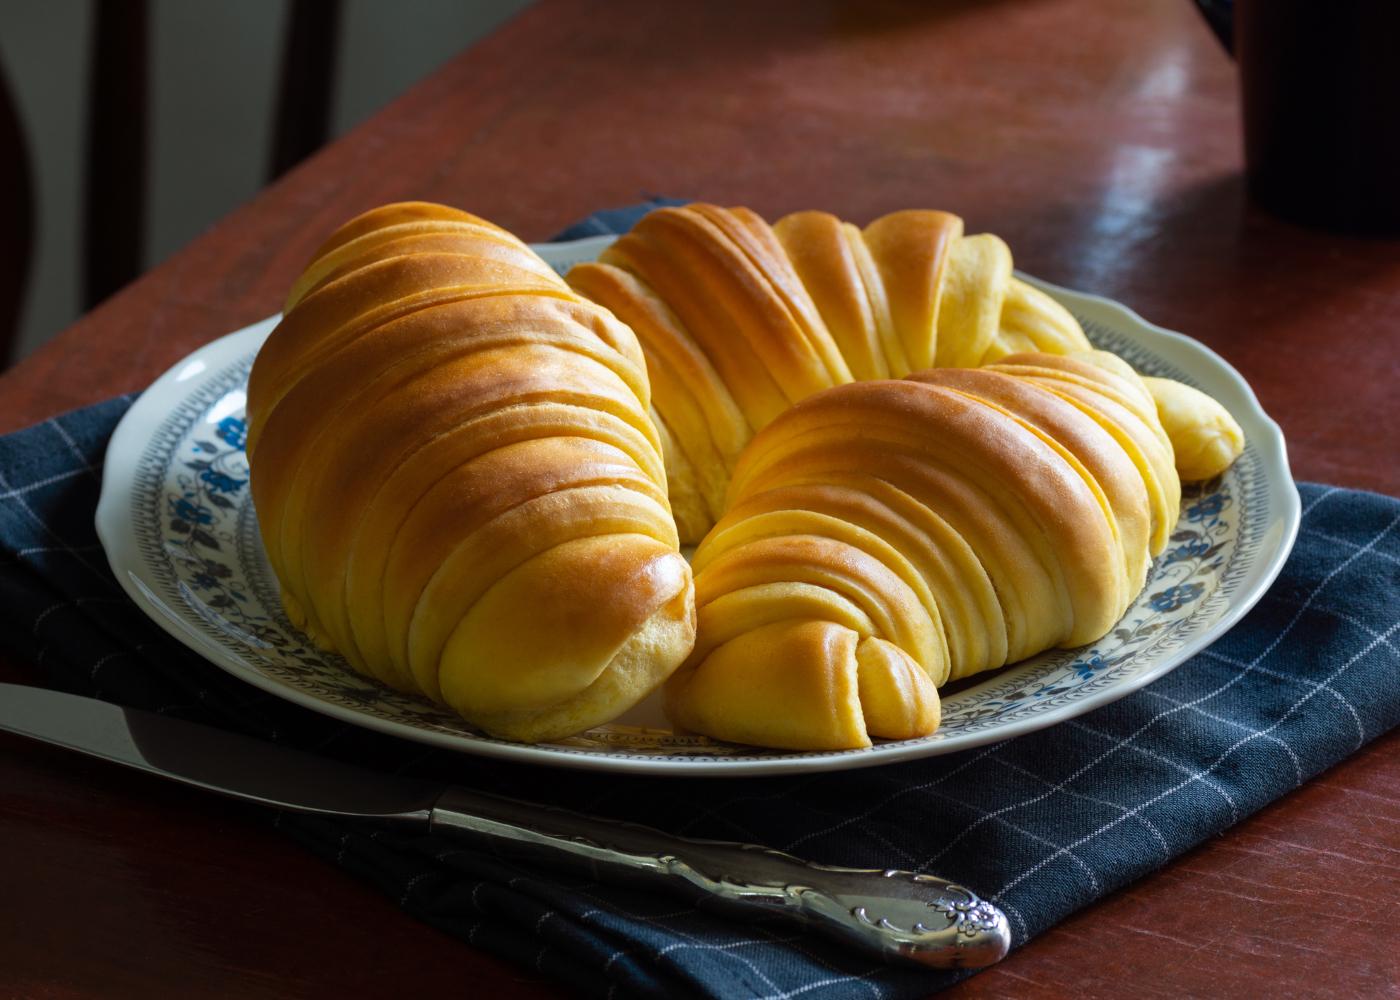 três croissants de massa brioche